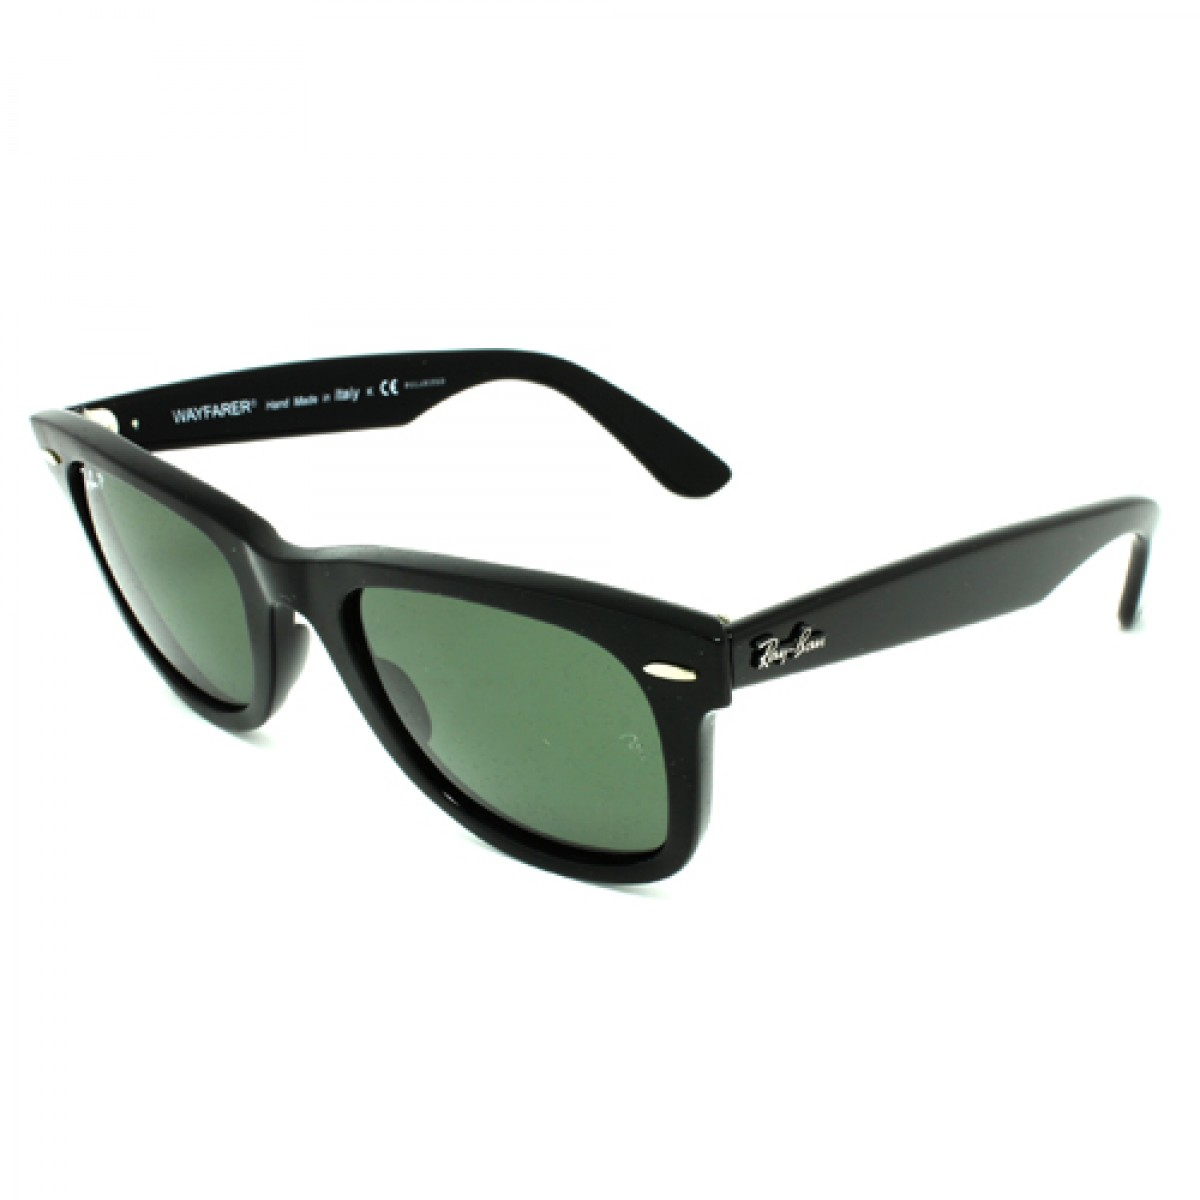 2a5c253371dc Ray Ban Original Wayfarer Polarized Unisex Sunglasses RB2140-901 58-50 -  Sunglasses - Fashion World